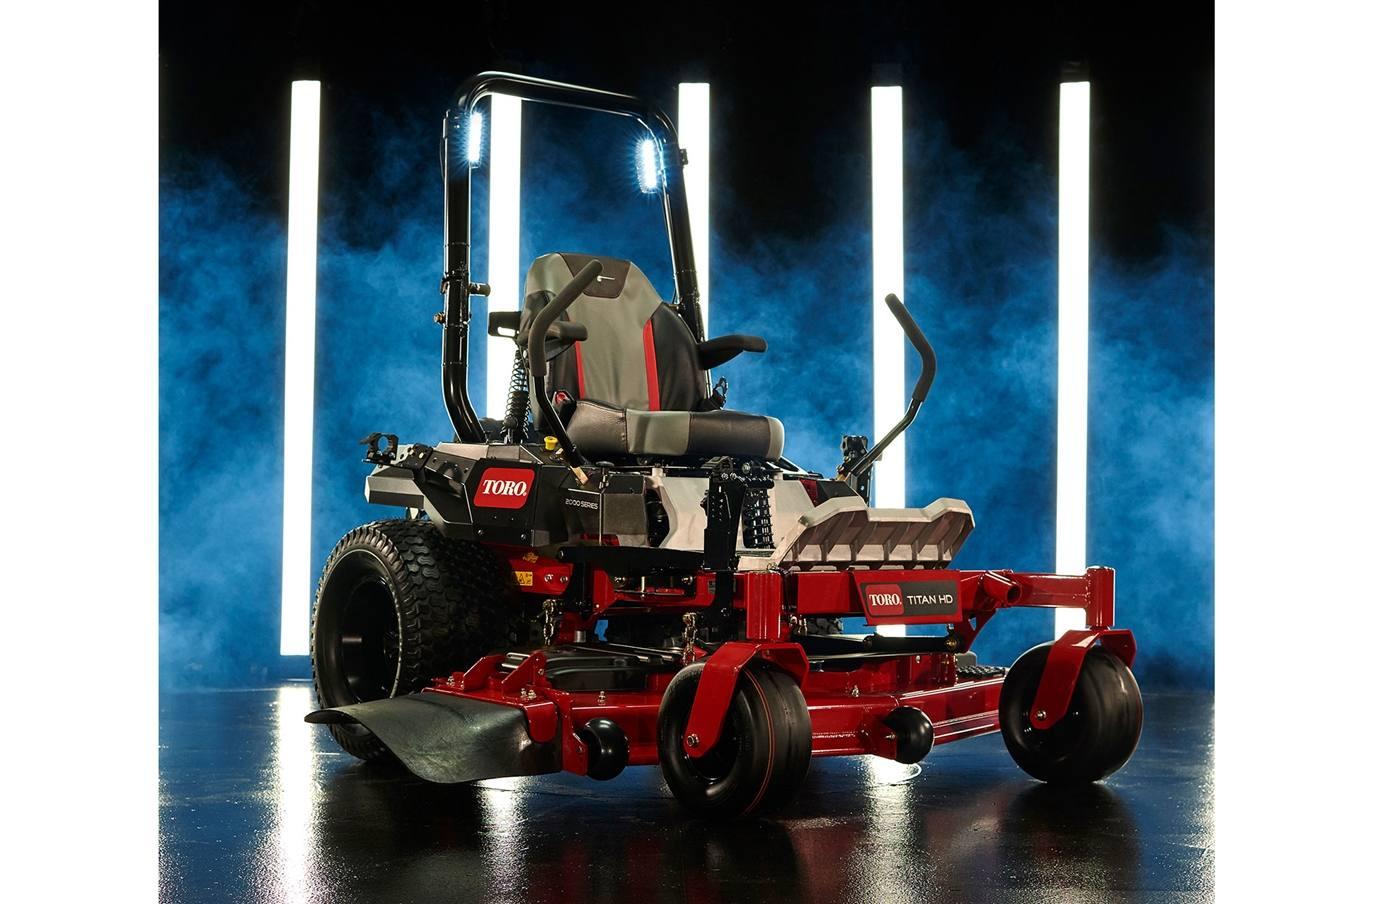 Toro 60 Quot Titan 174 Hd 2000 Series Myride 174 74480 For Sale In